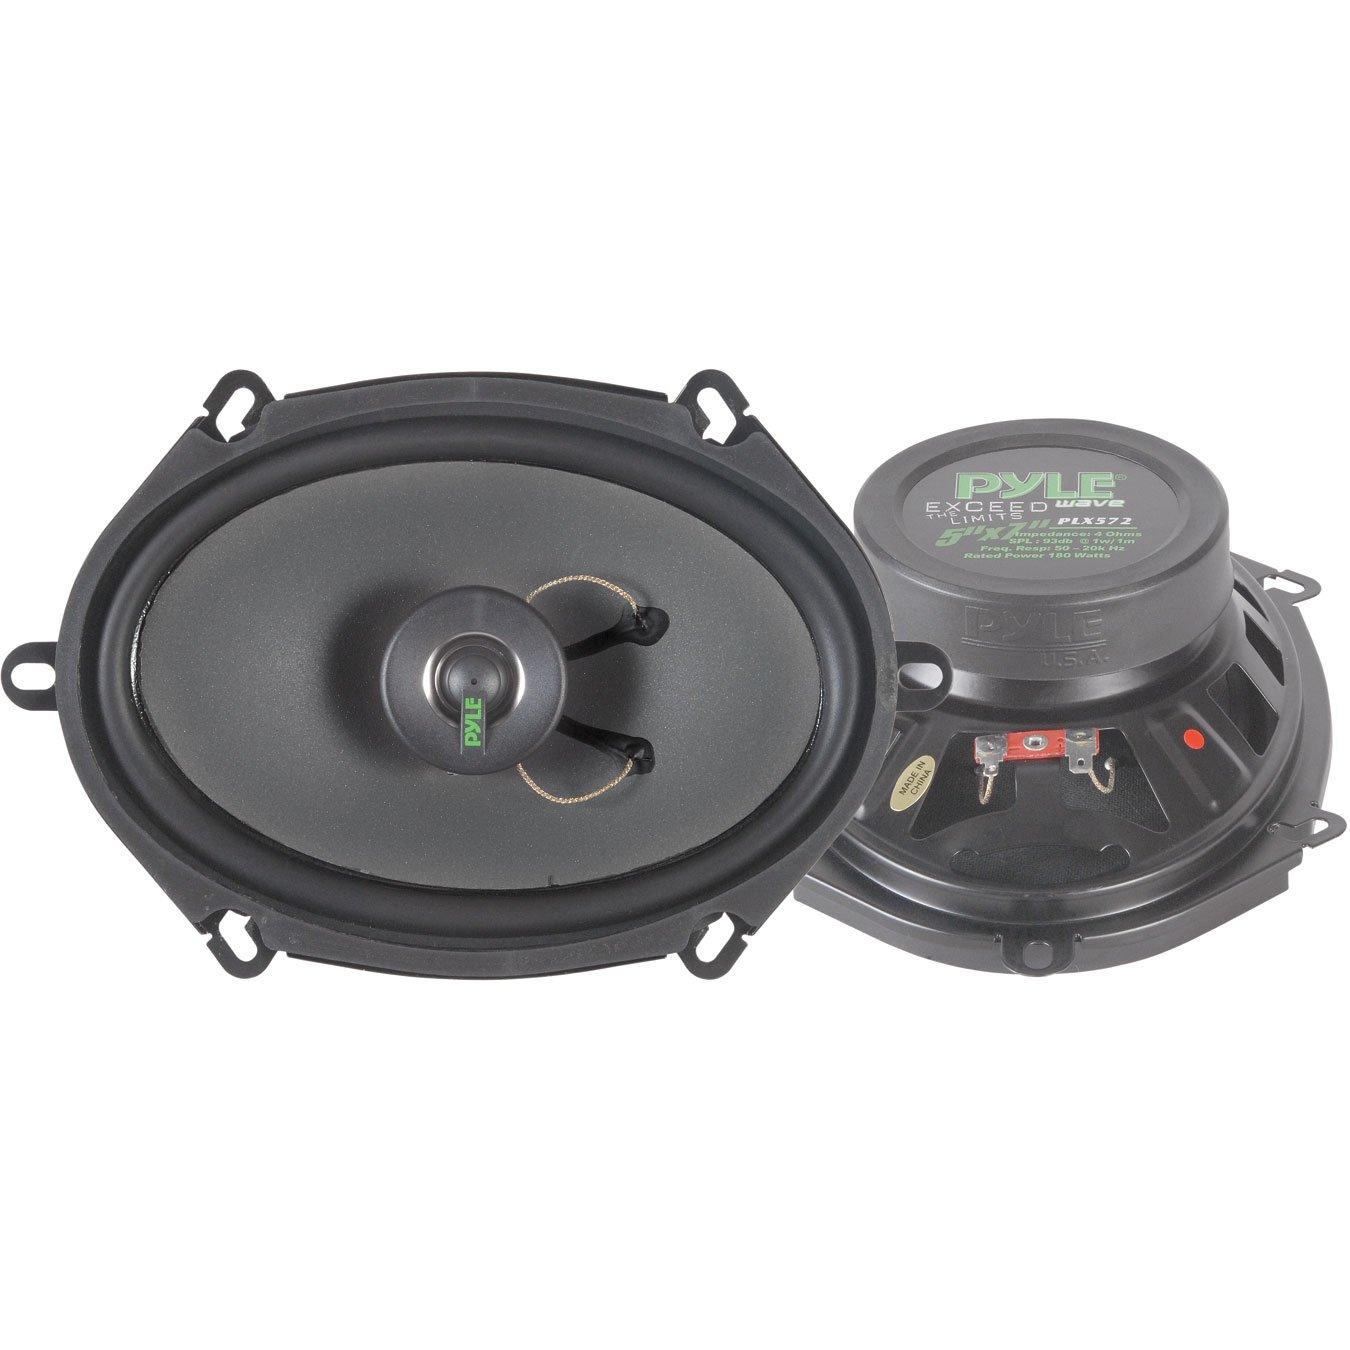 Amazon.com: PYLE PLX462 4-Inch x 6-Inch 160 Watt Two-Way Speakers ...